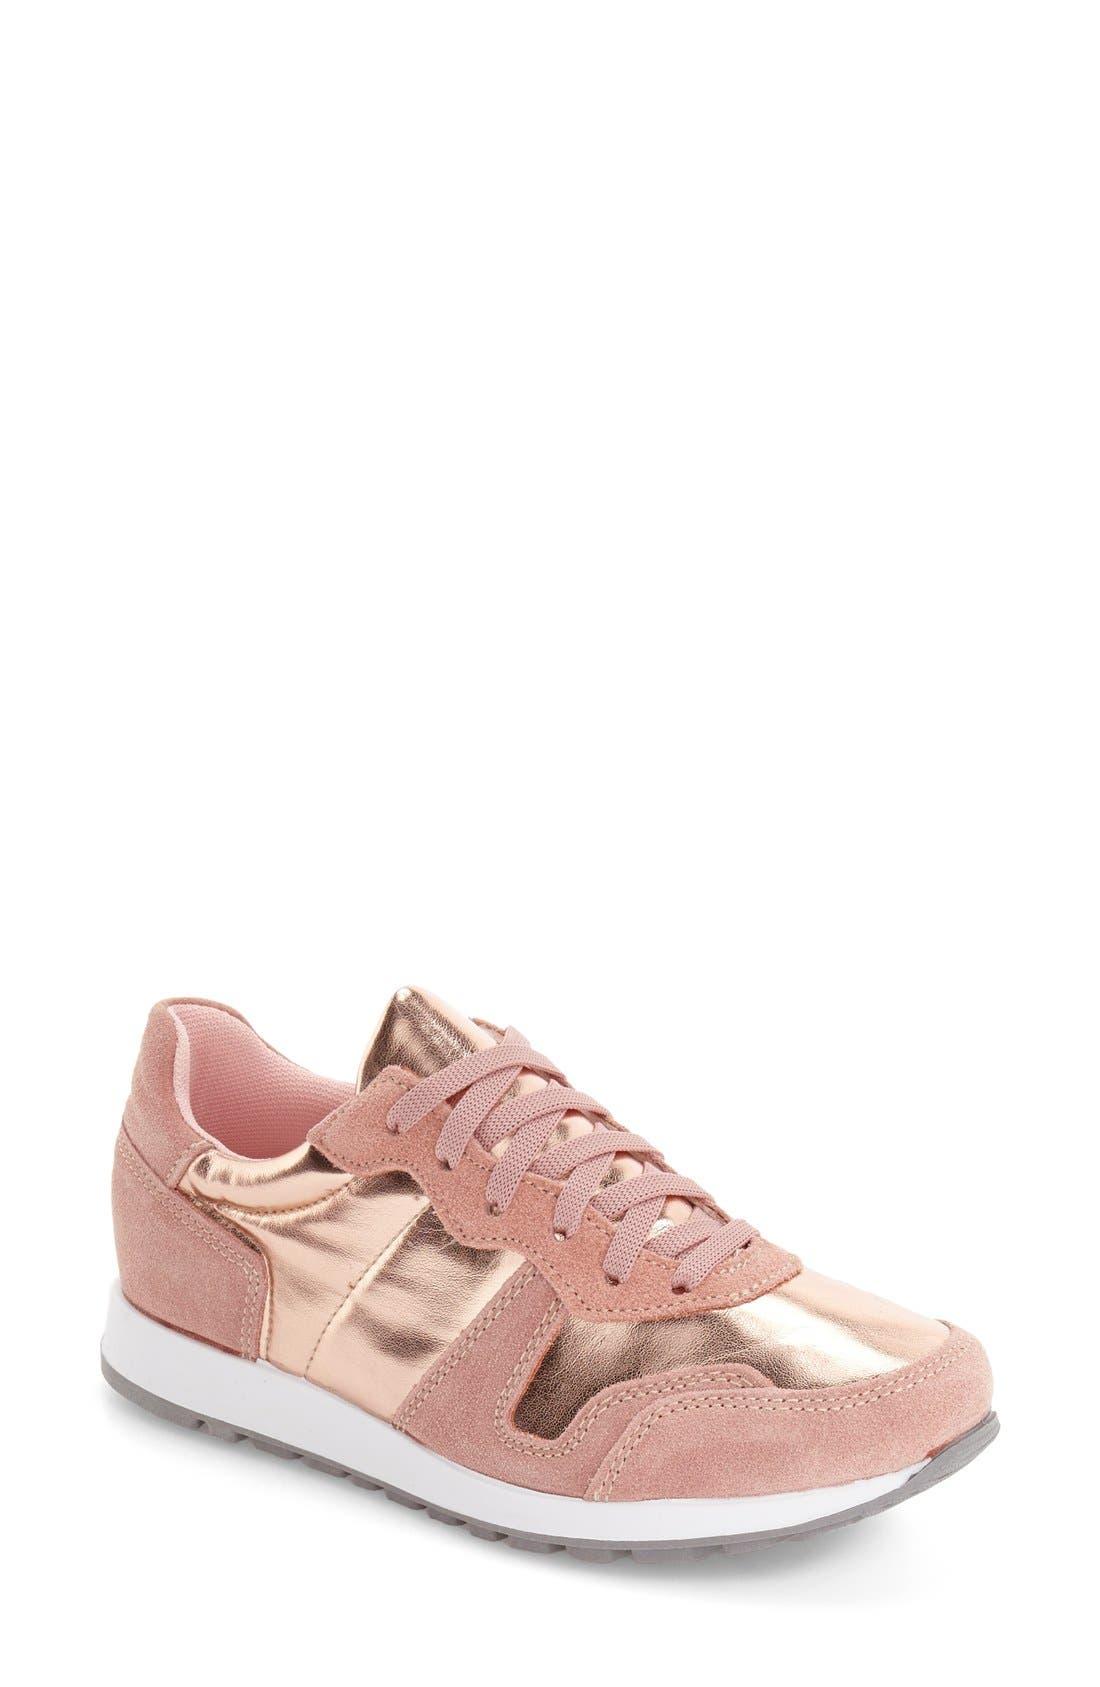 Alternate Image 1 Selected - Topshop Charlie Sneaker (Women)